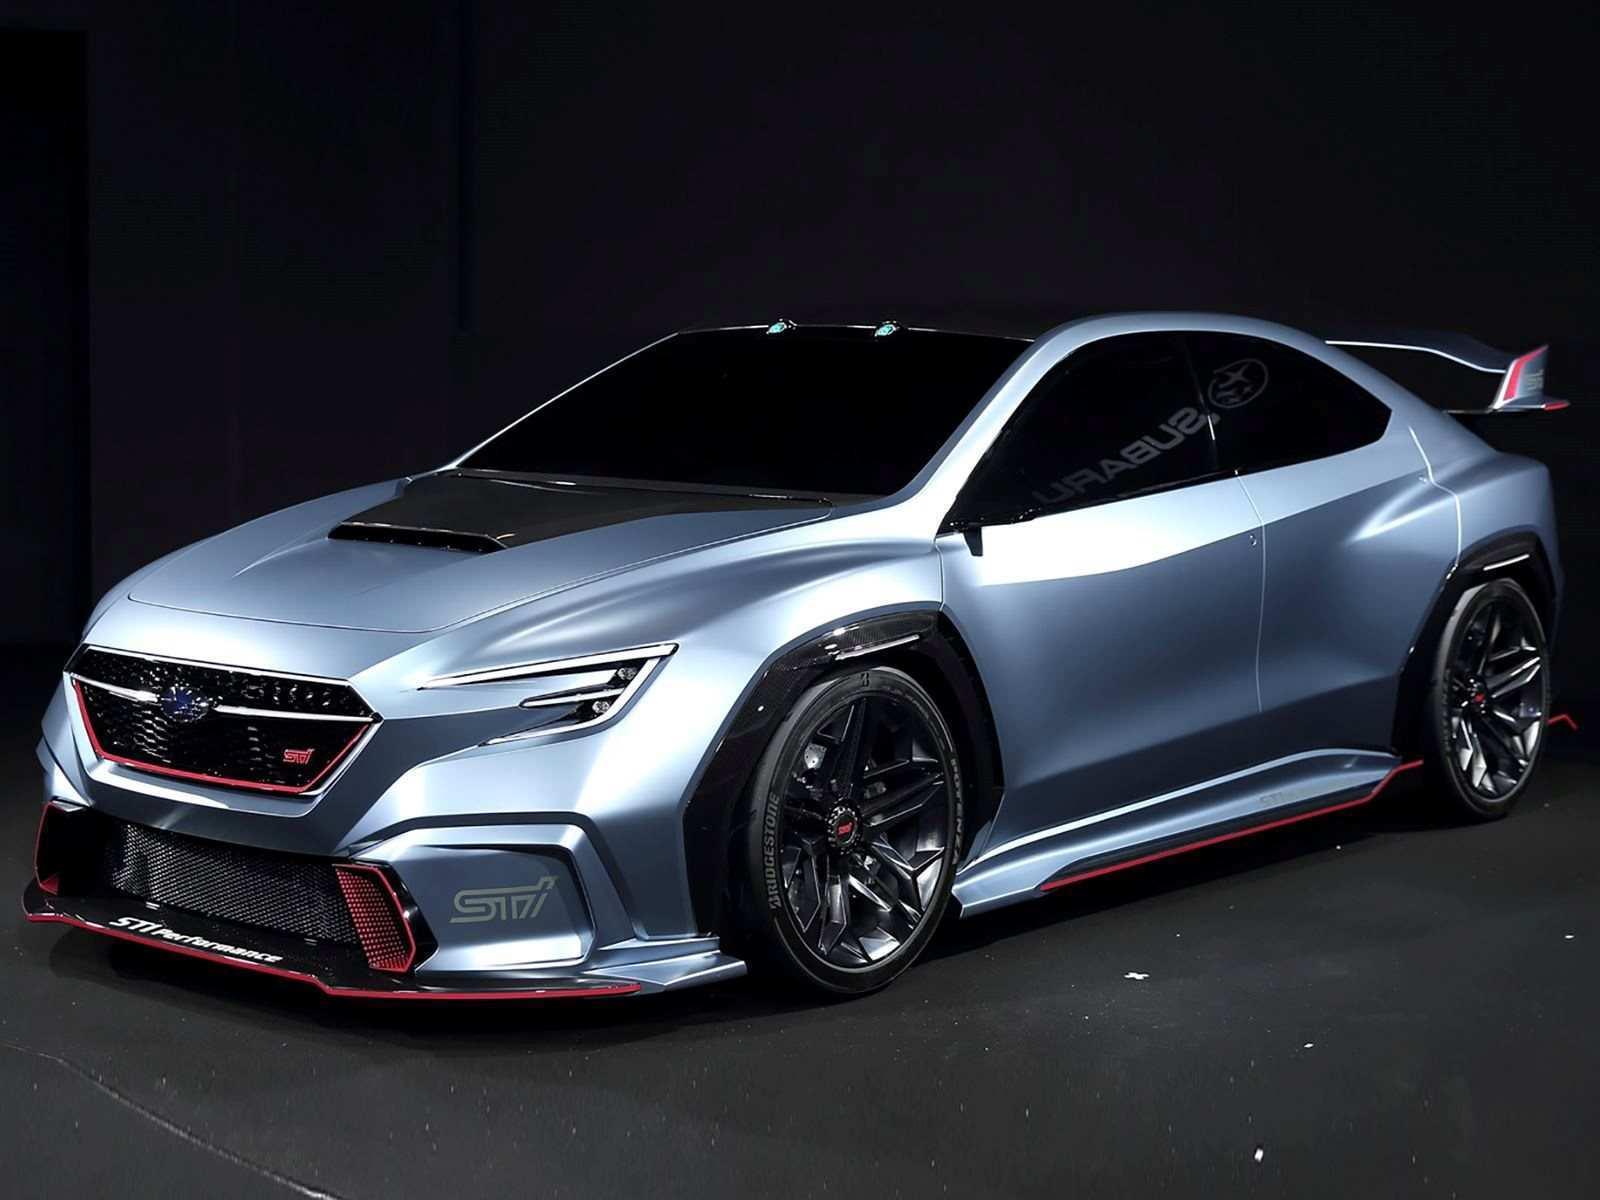 89 Great Subaru 2020 Sport Speed Test for Subaru 2020 Sport